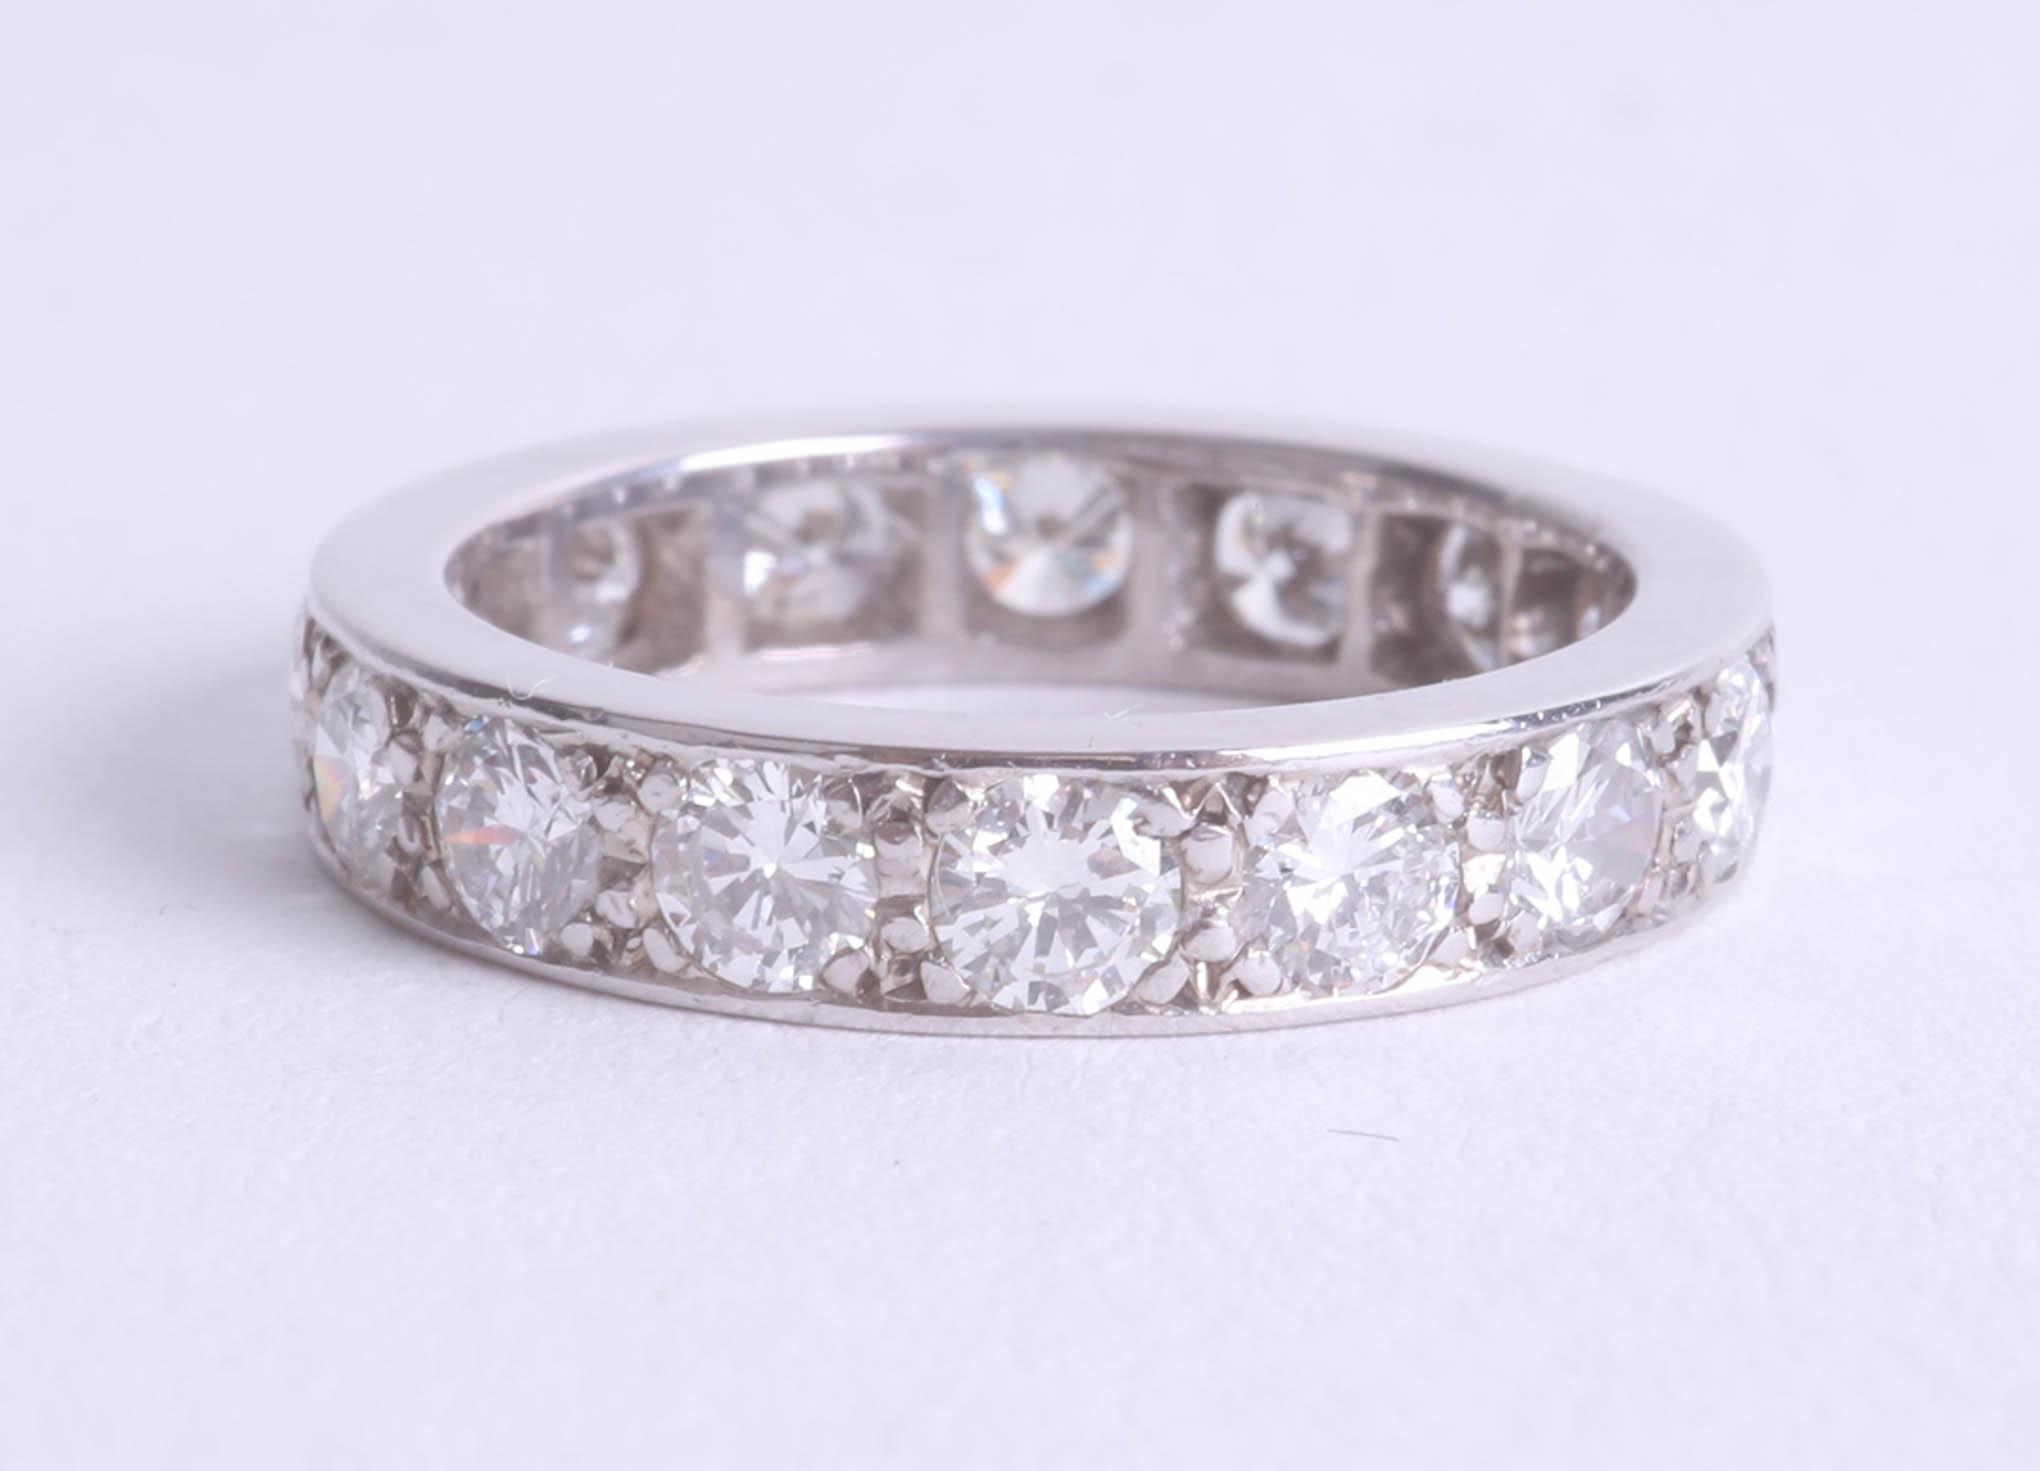 Lot 106 - A diamond full band eternity ring probably platinum, size I.